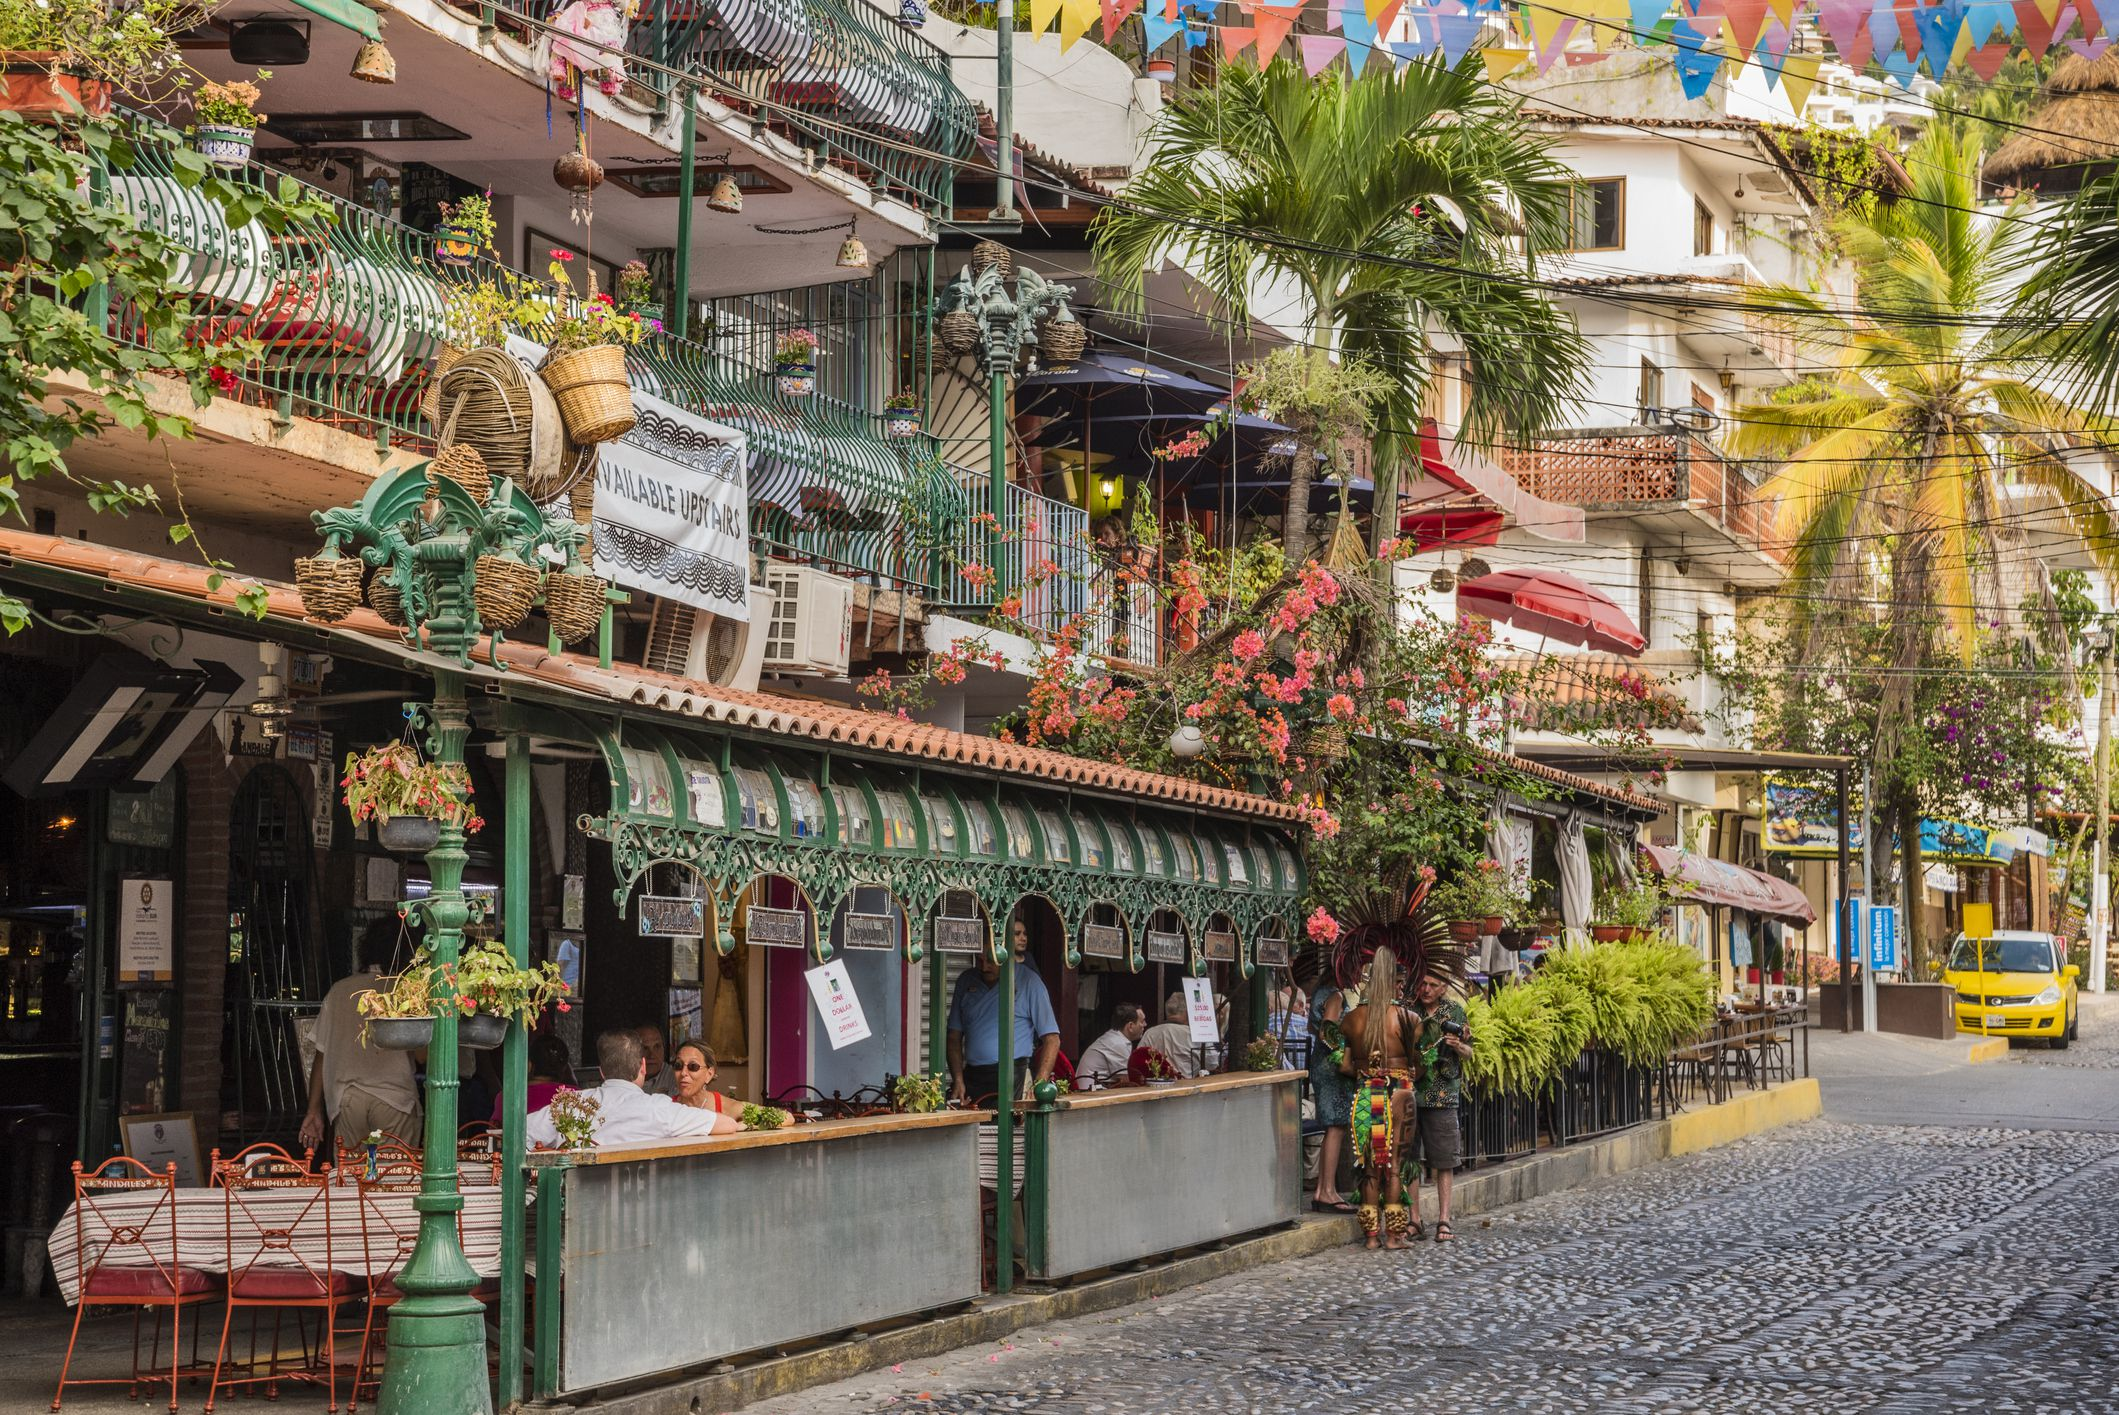 The zona romantica in Puerta Vallarta